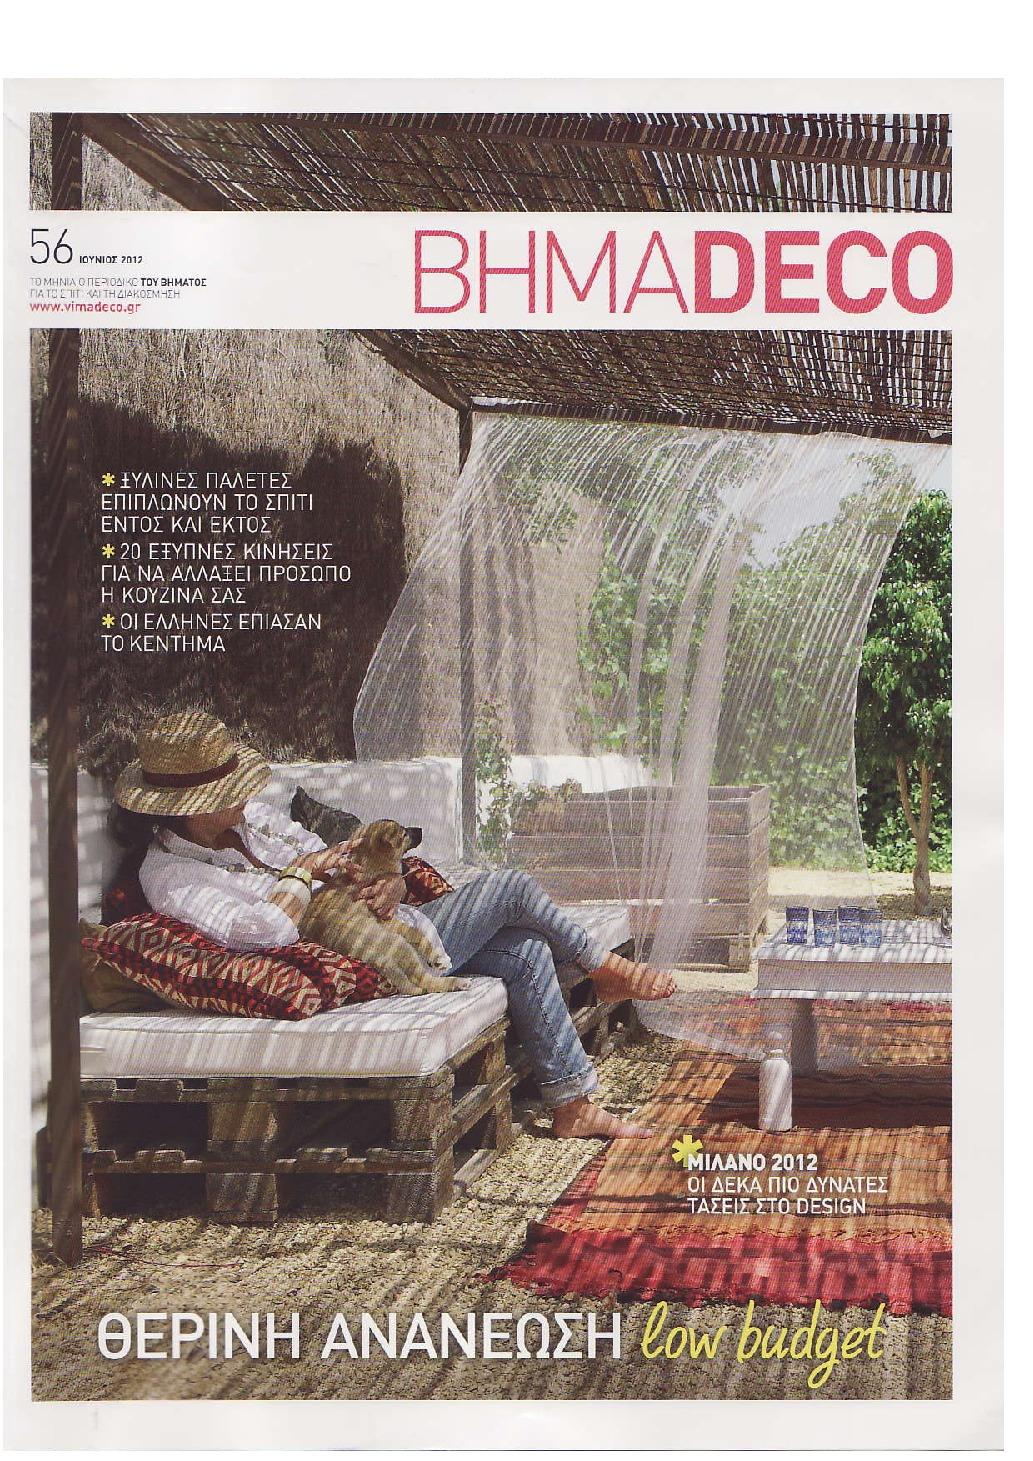 BHMADECO_rb_jun12-0